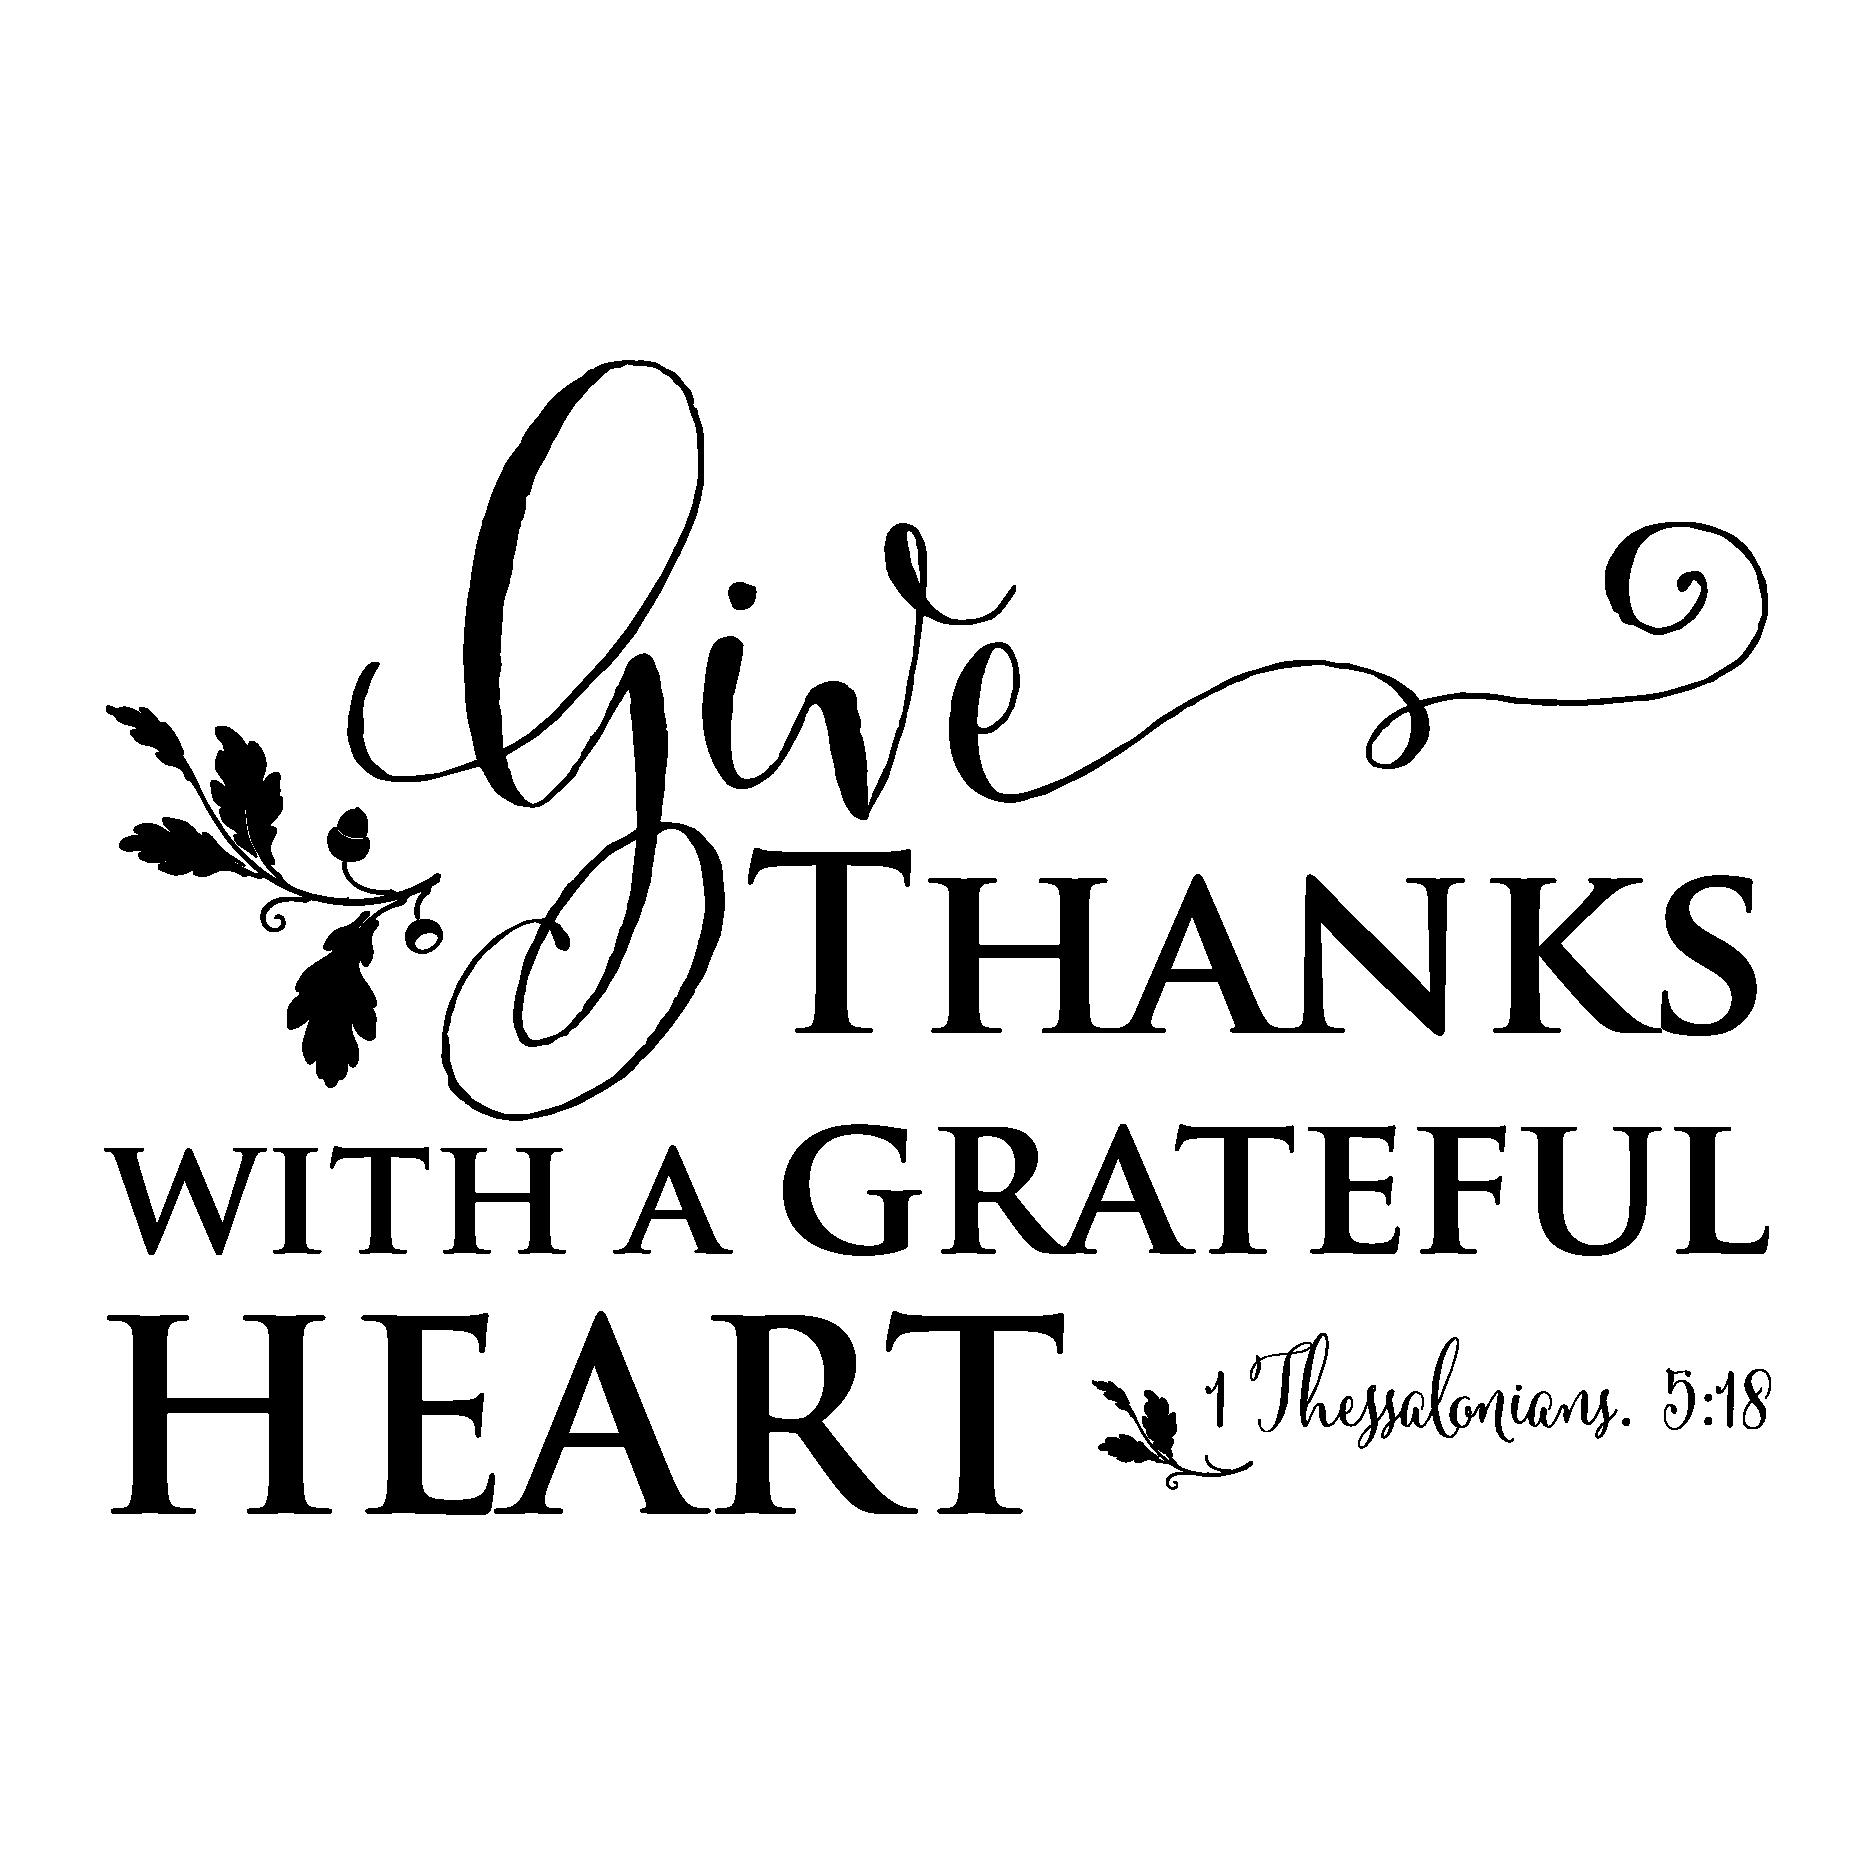 relg0330-02